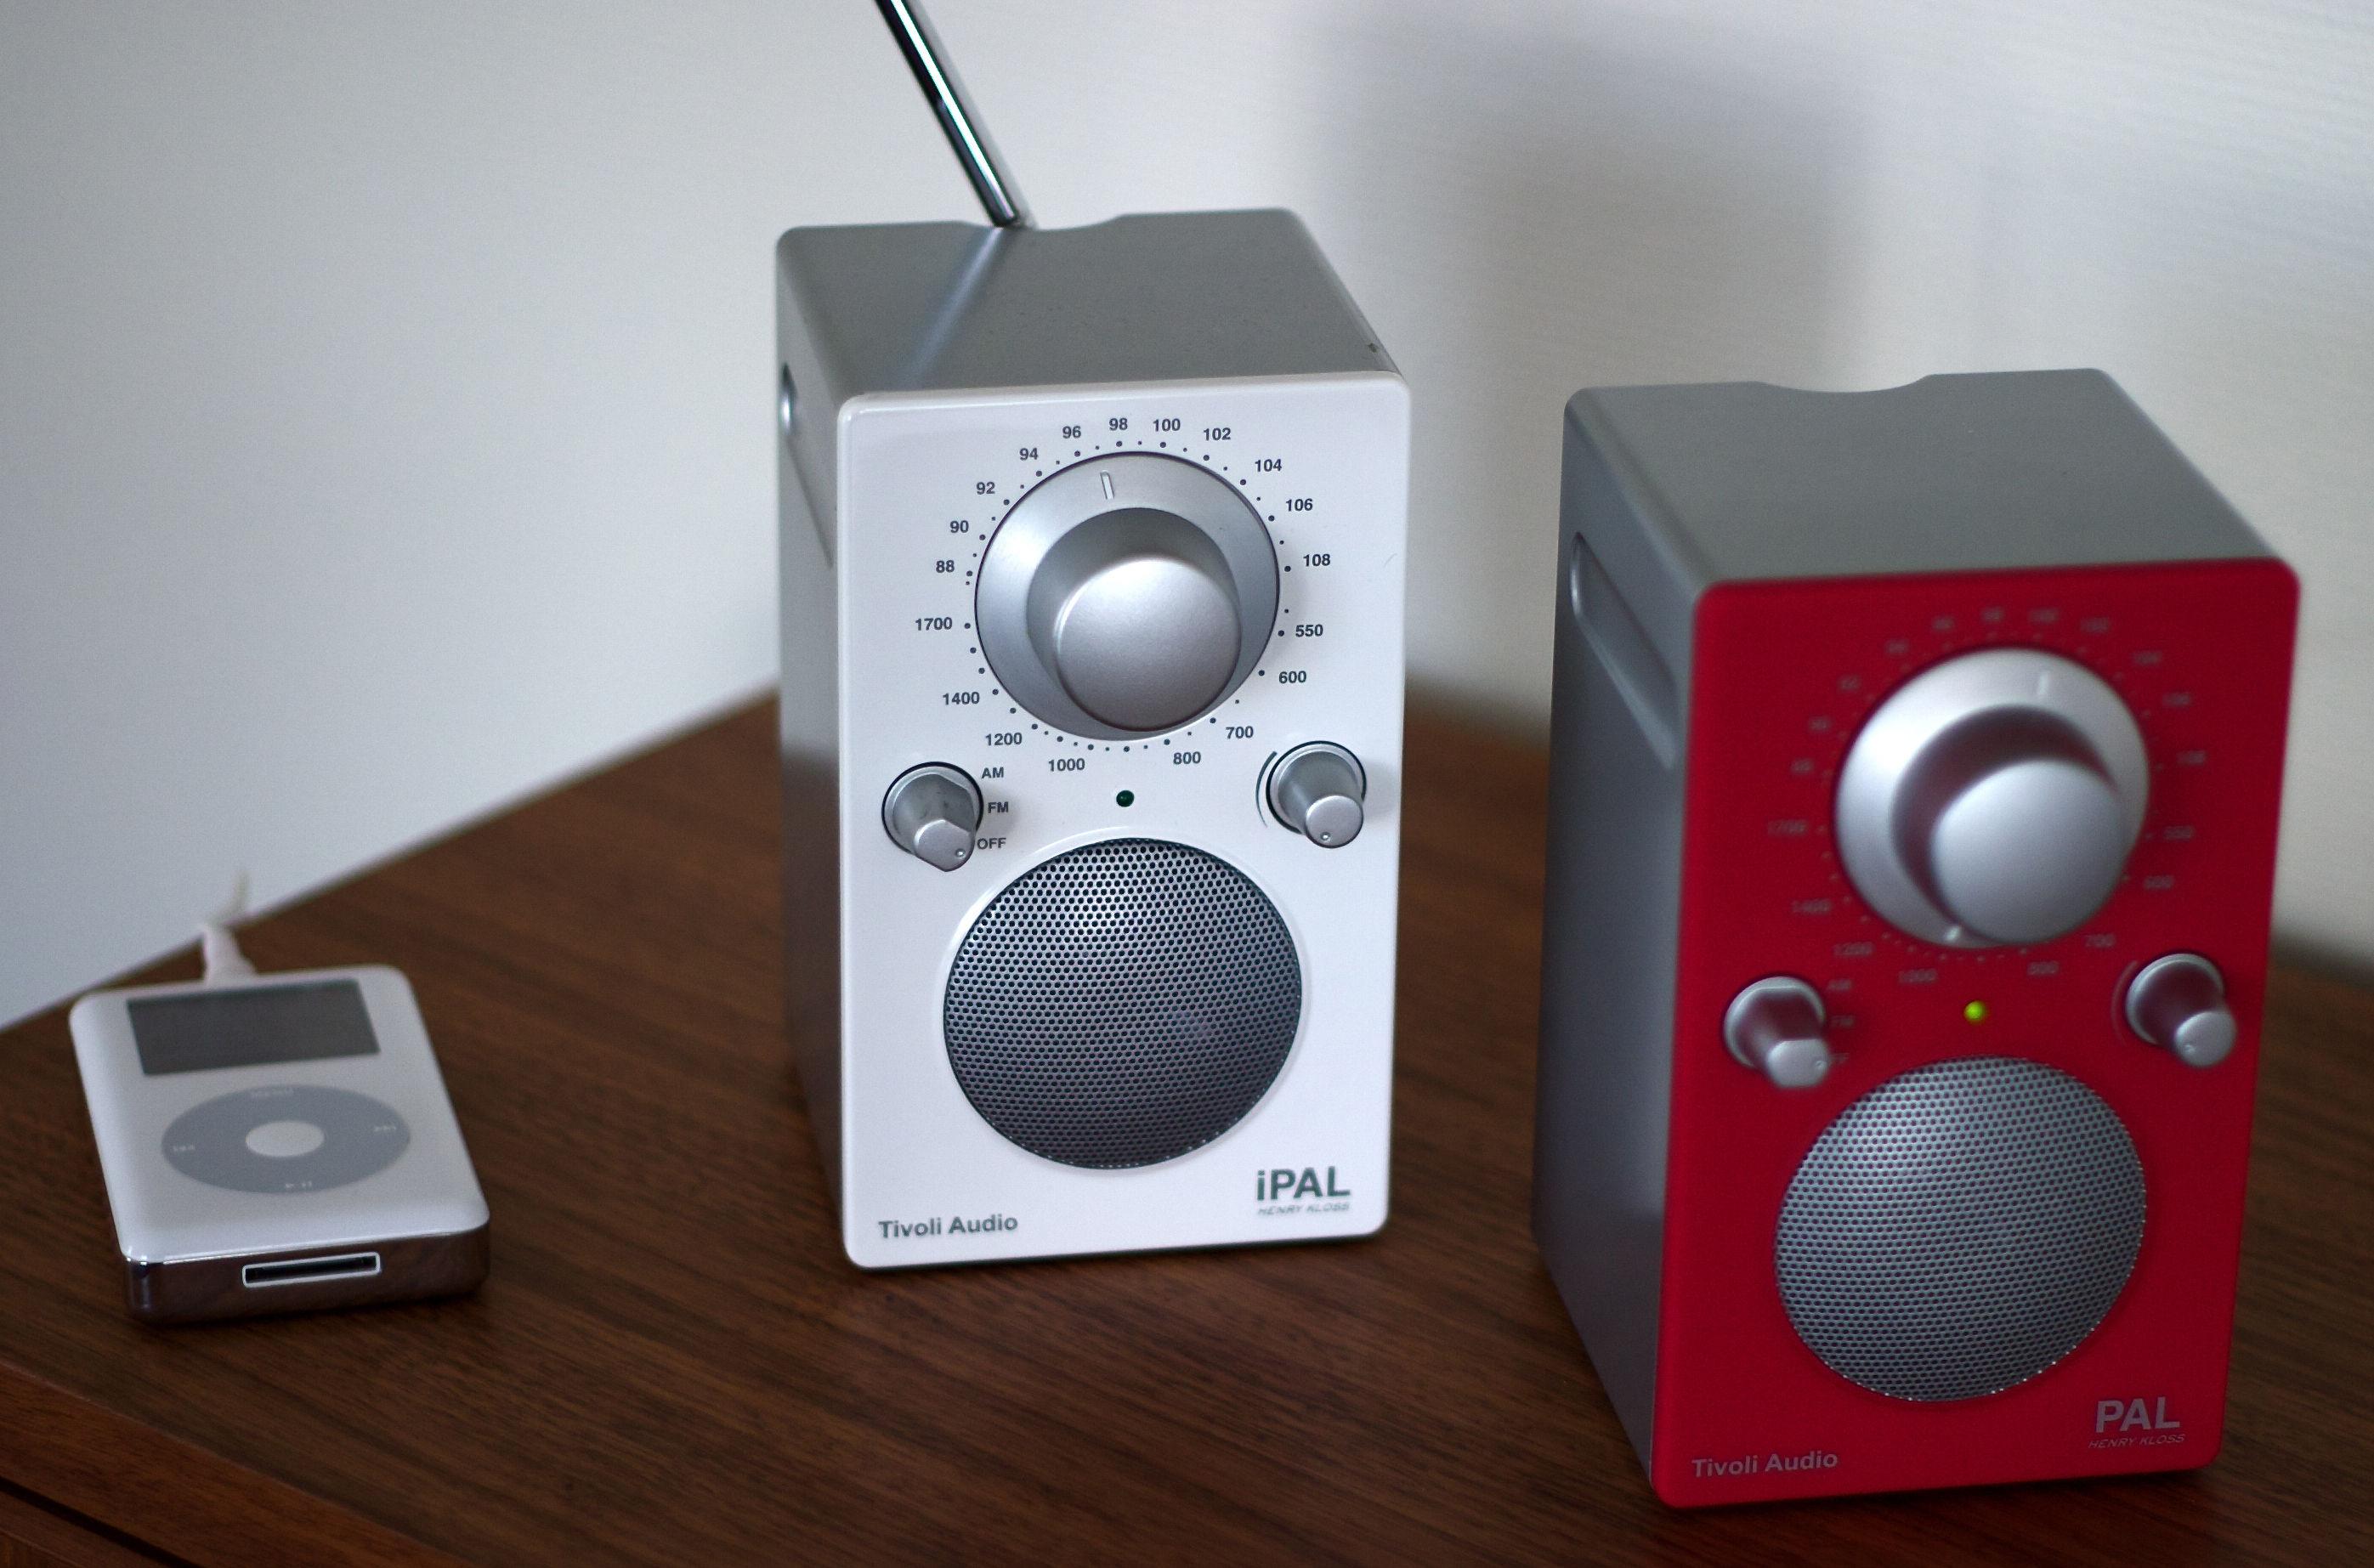 radio ipal enceinte portative compatible ipod blanc tivoli audio. Black Bedroom Furniture Sets. Home Design Ideas